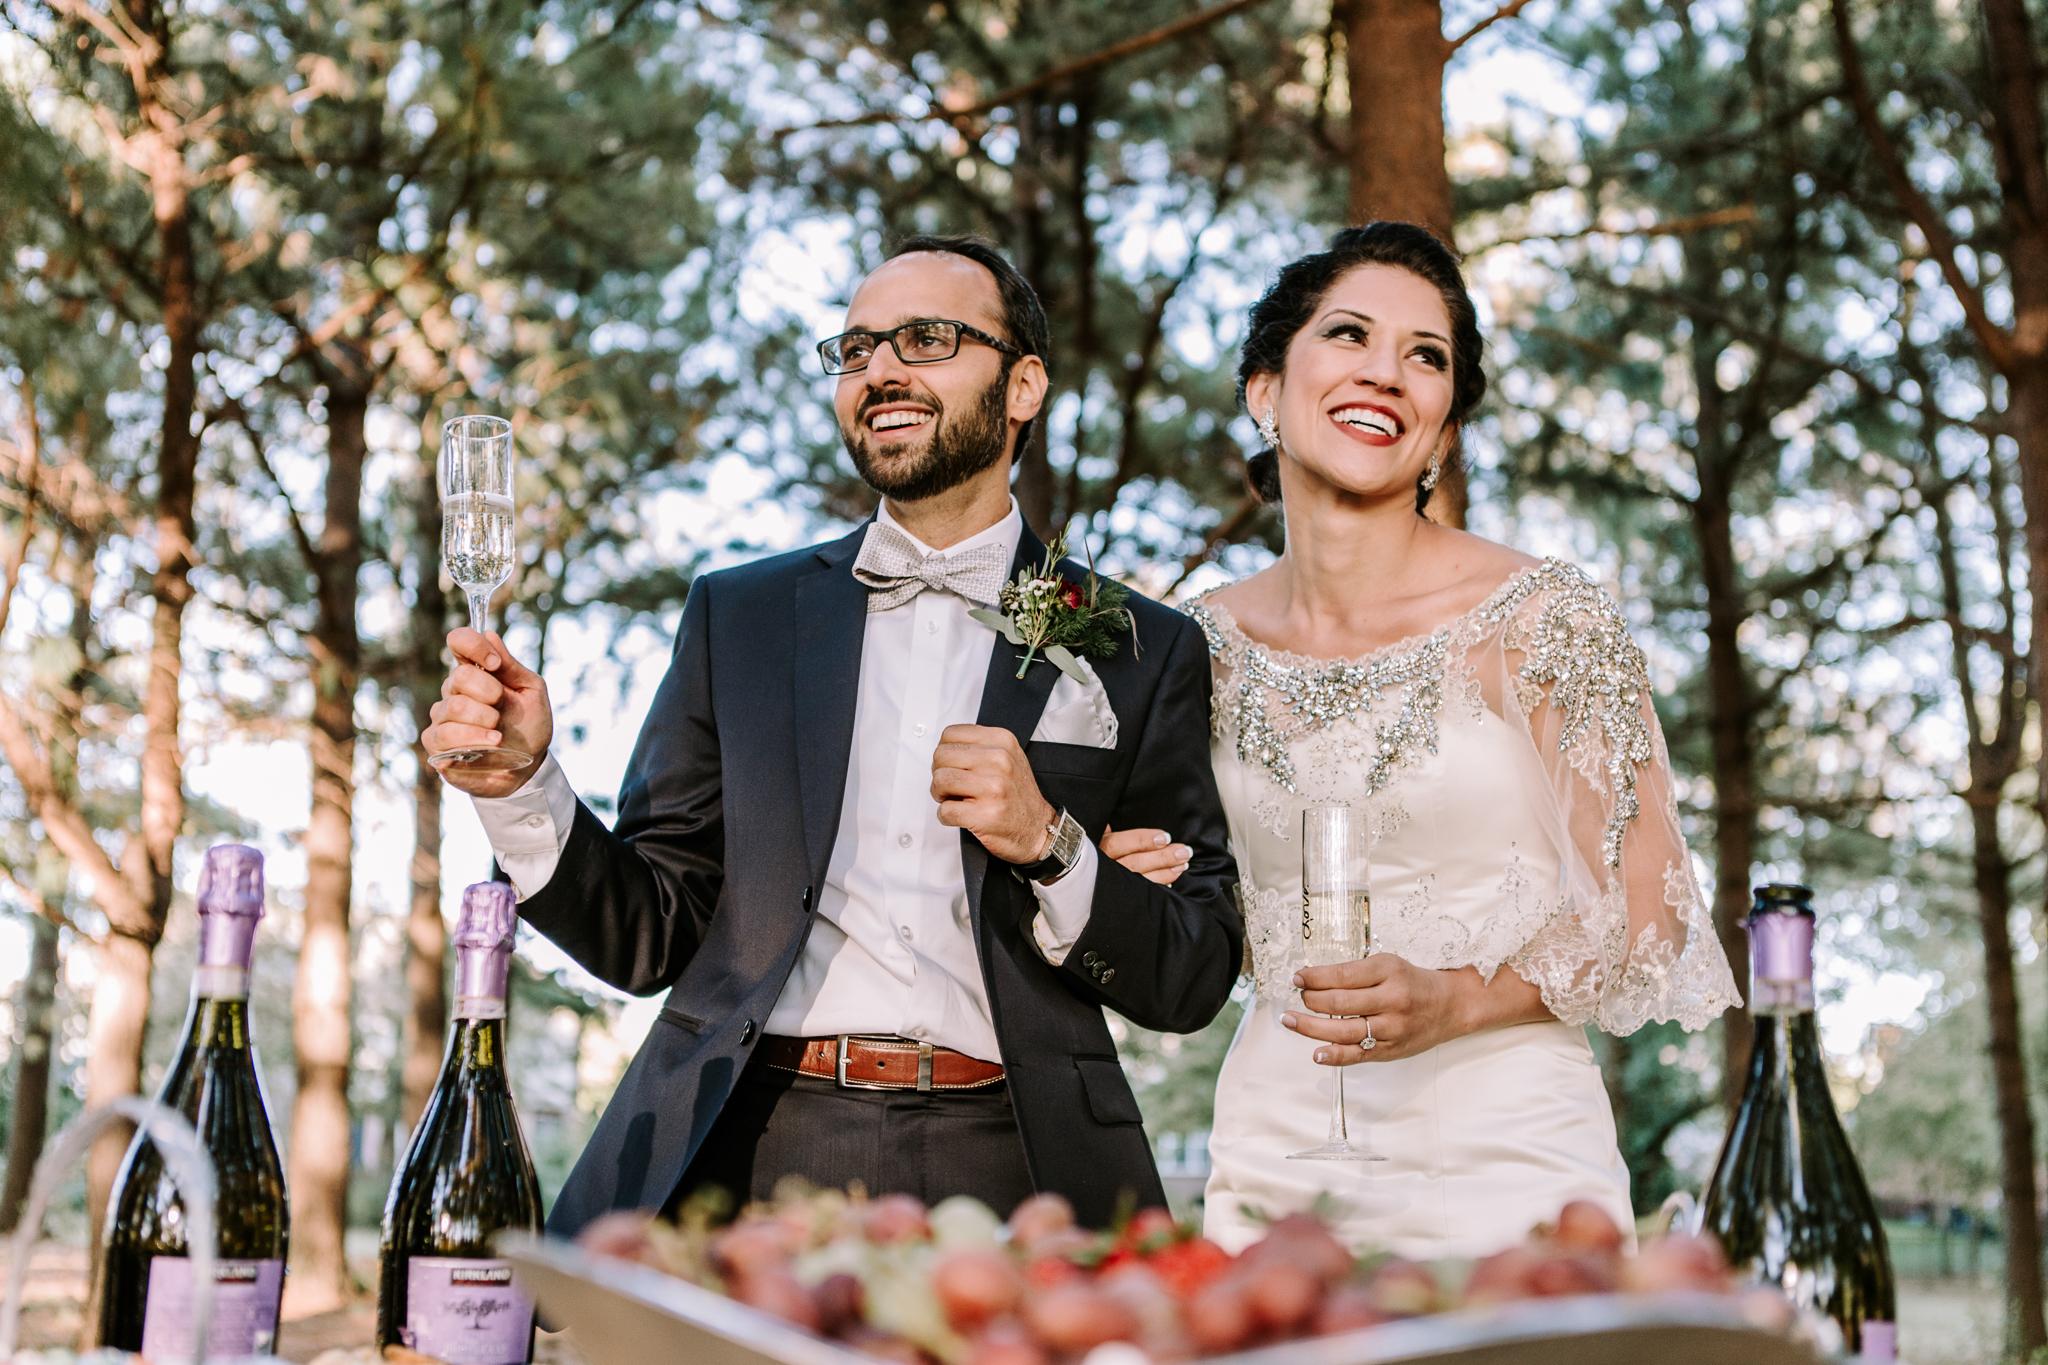 Richmond Kentucky Wedding Photographer - Ariana Jordan Photography -13.jpg